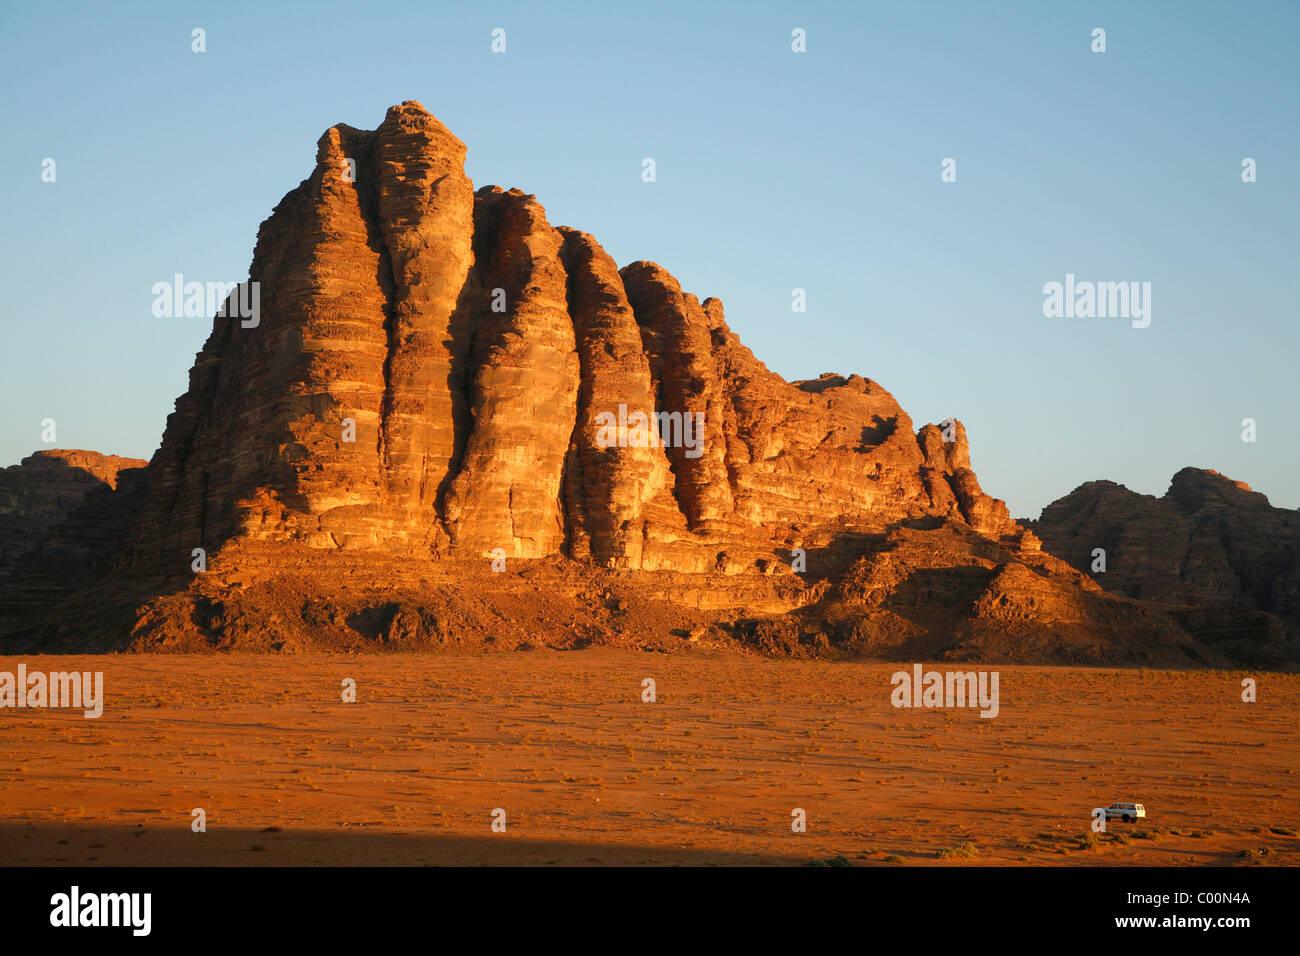 The Seven Pillars of Wisdom rock formation, Wadi Rum, Jordan. - Stock Image